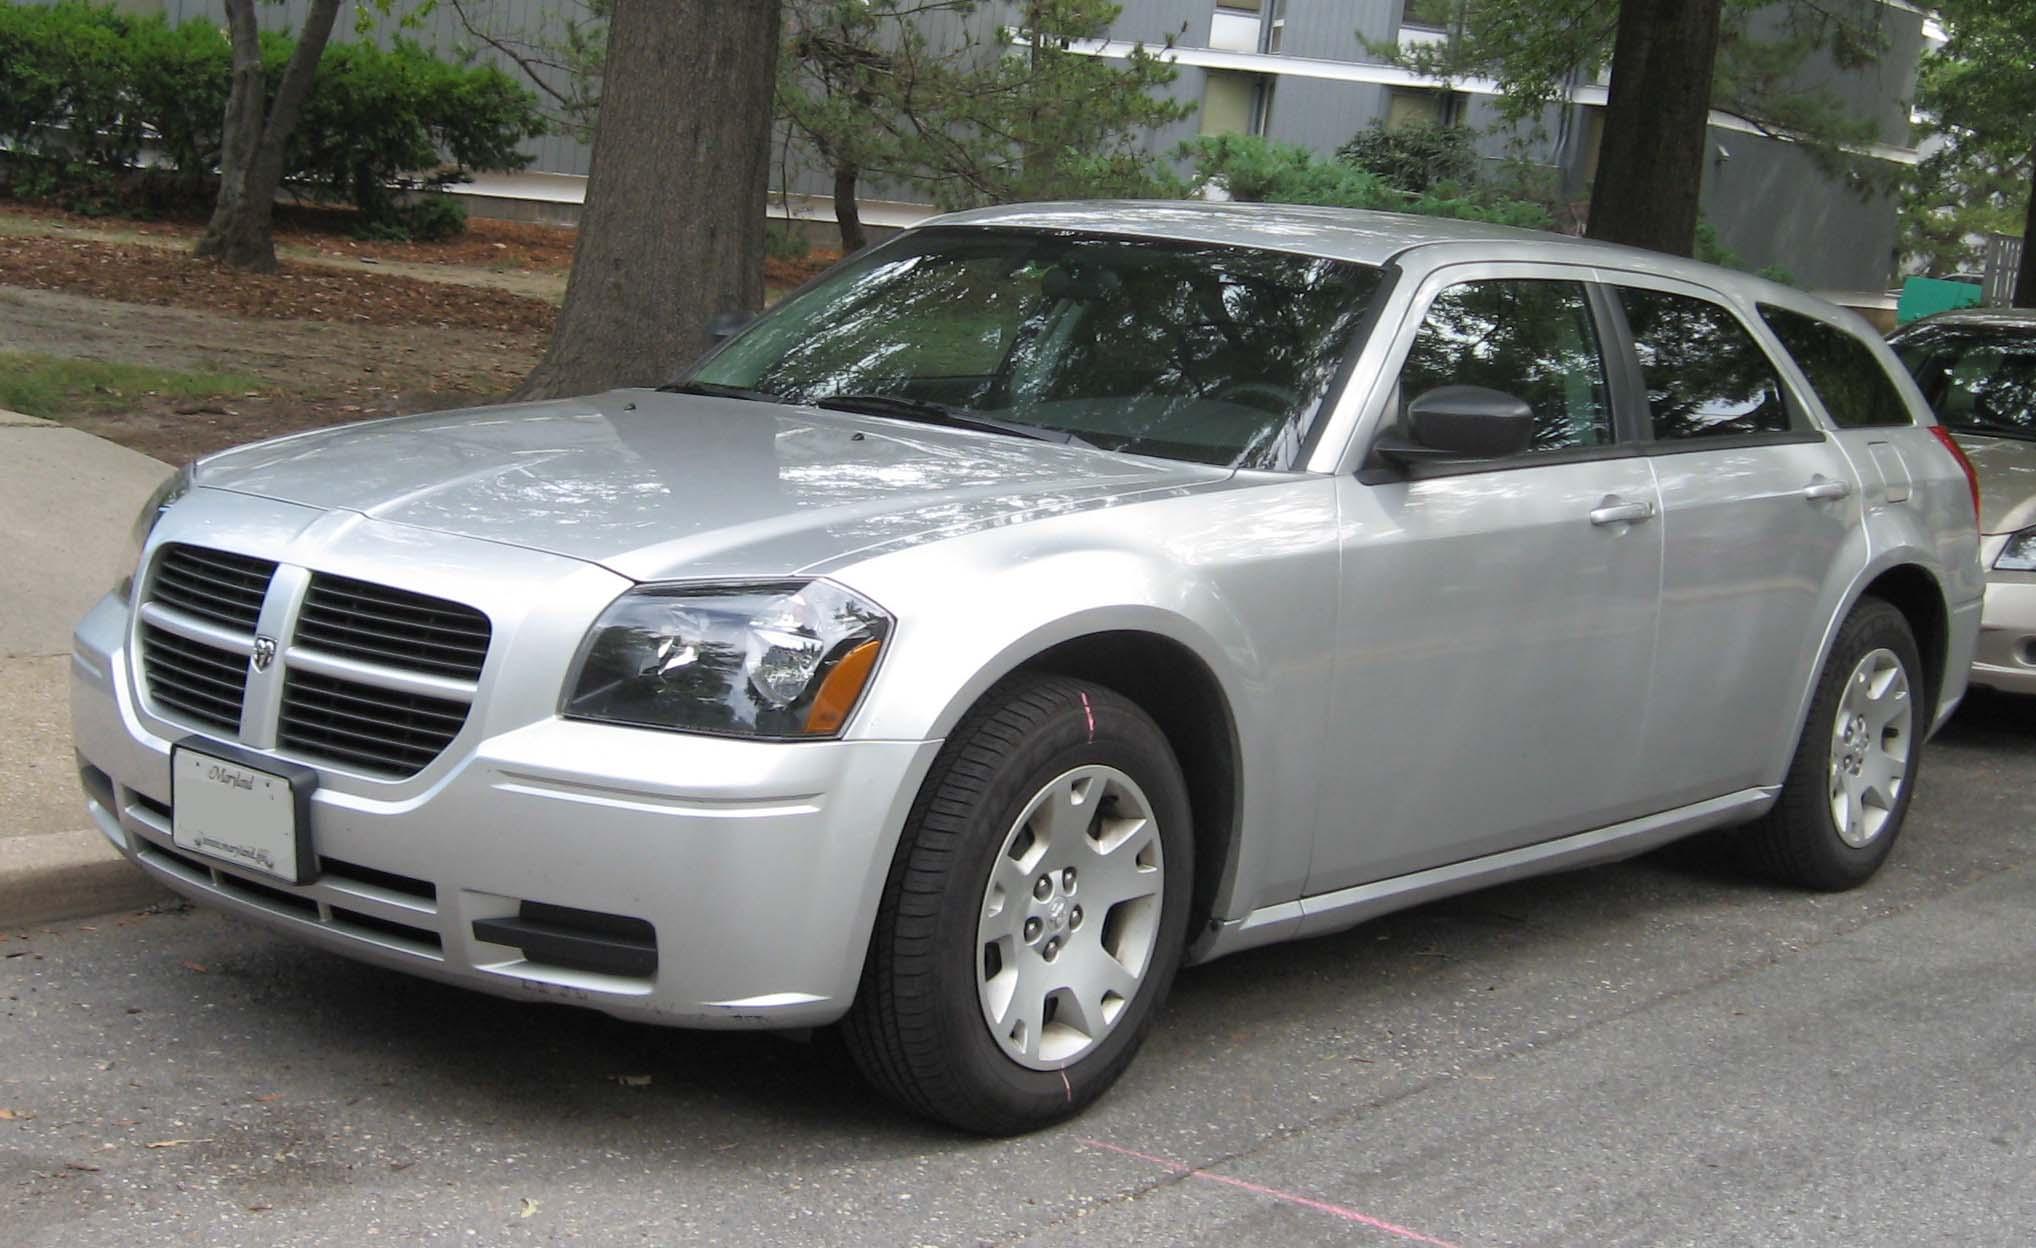 [TVPR_3874]  Dodge Magnum:picture # 13 , reviews, news, specs, buy car | Dodge Magnum Se Engine Diagram |  | GoMotors.net